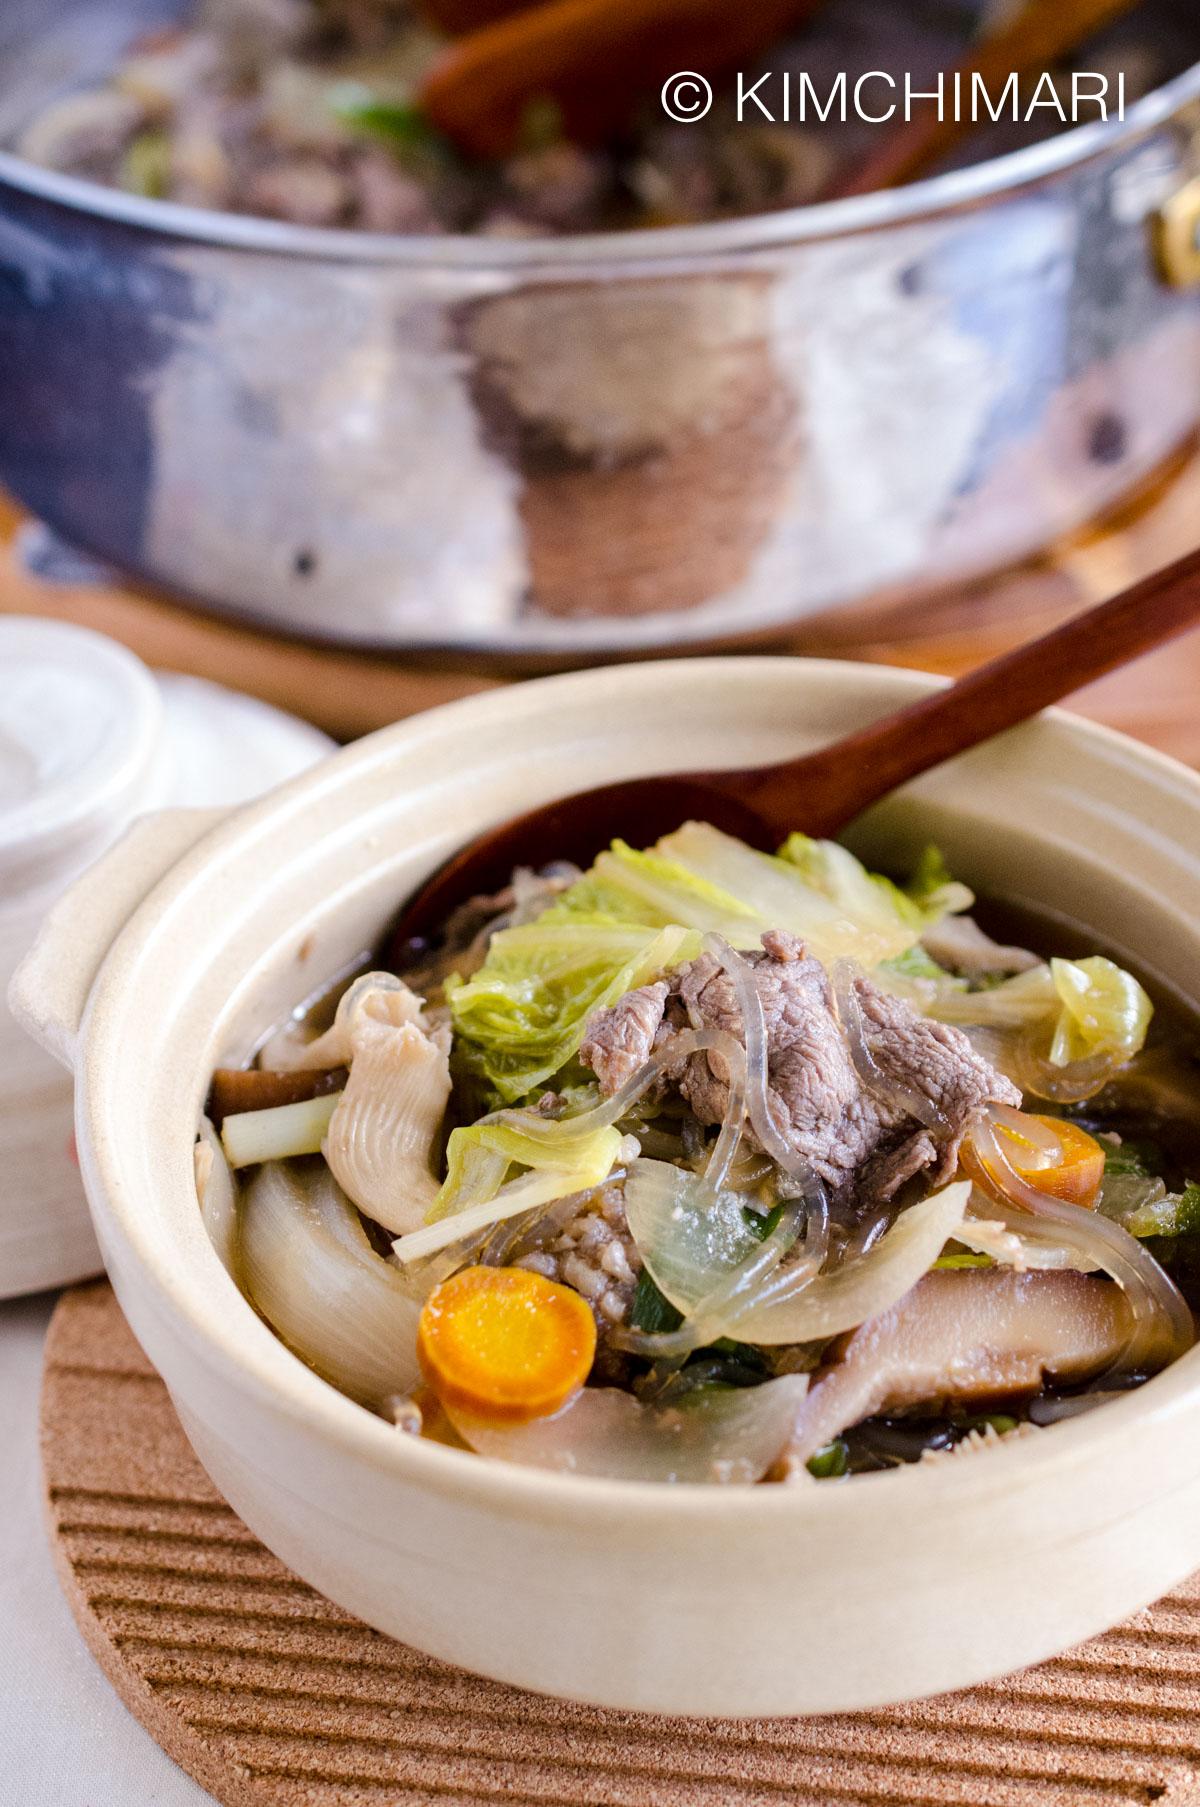 Bulgogi Hot Pot Jeongol with Glass Noodles and Vegetables